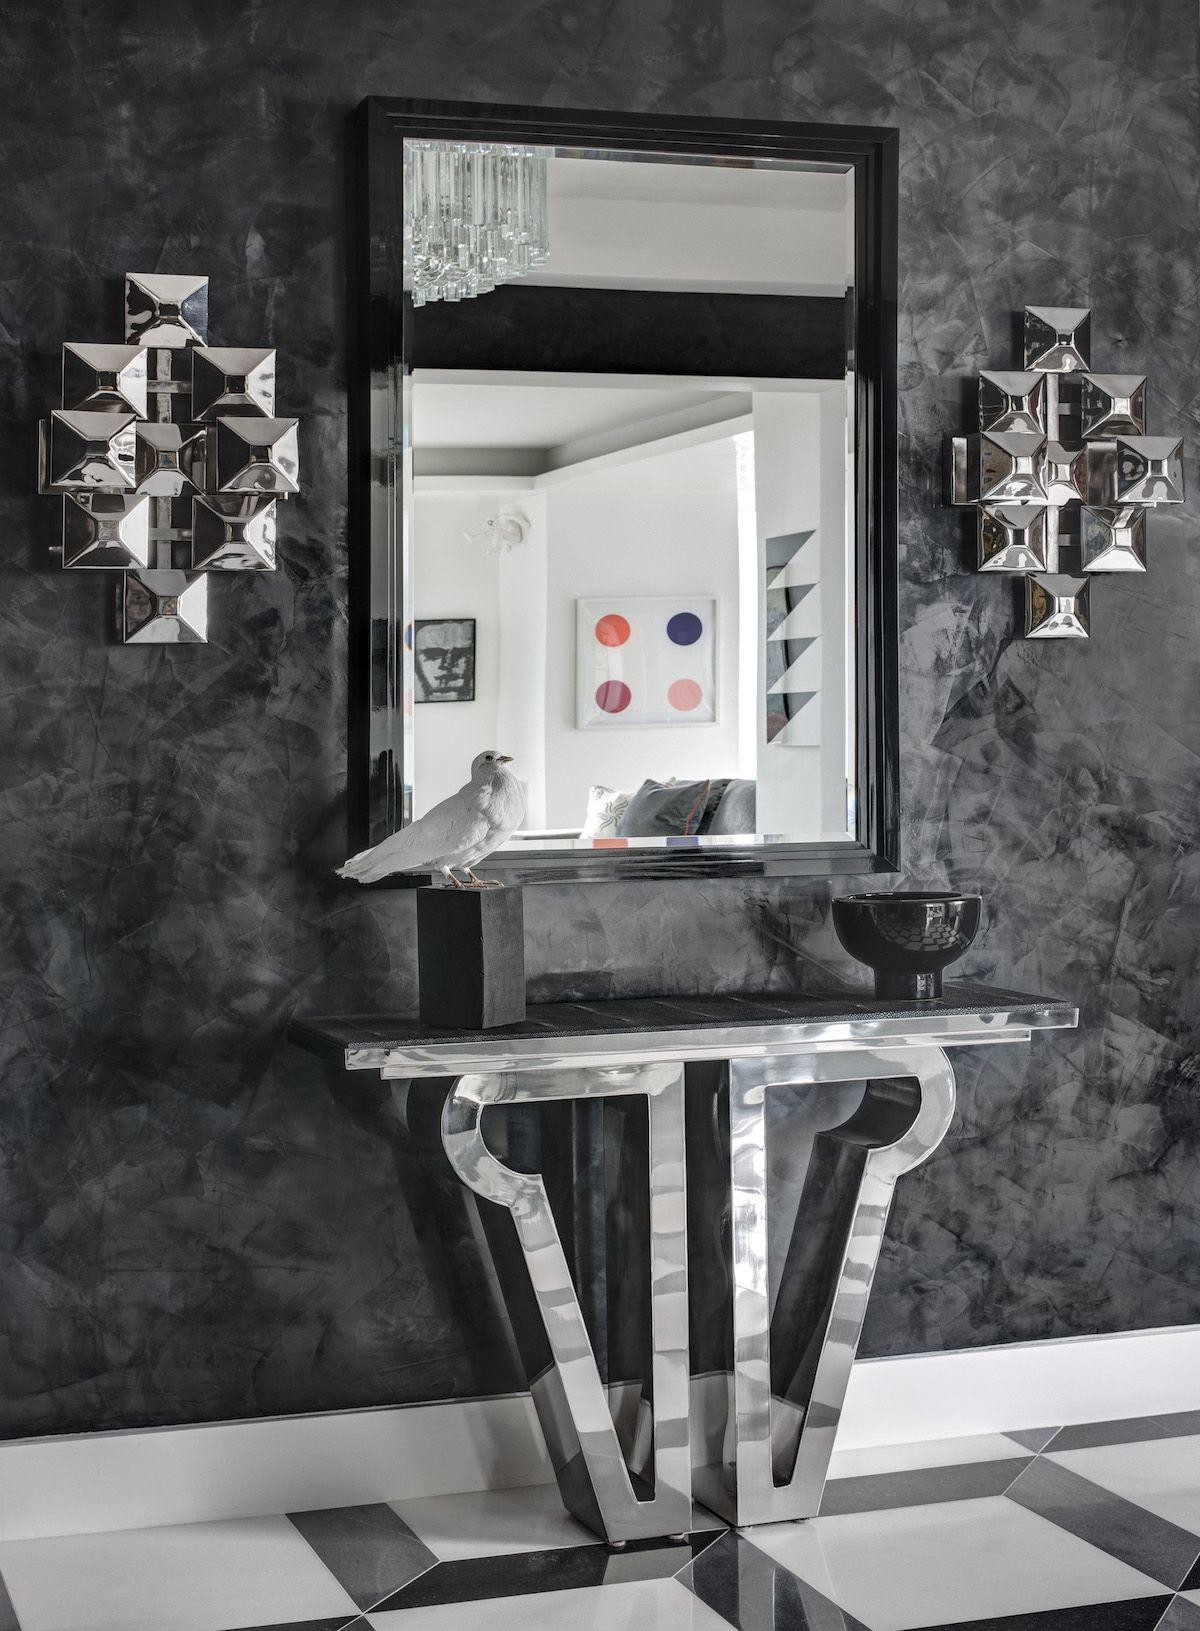 Moderne wohnideen außen eric roseff designs bruce buck photography ritz carlton residential